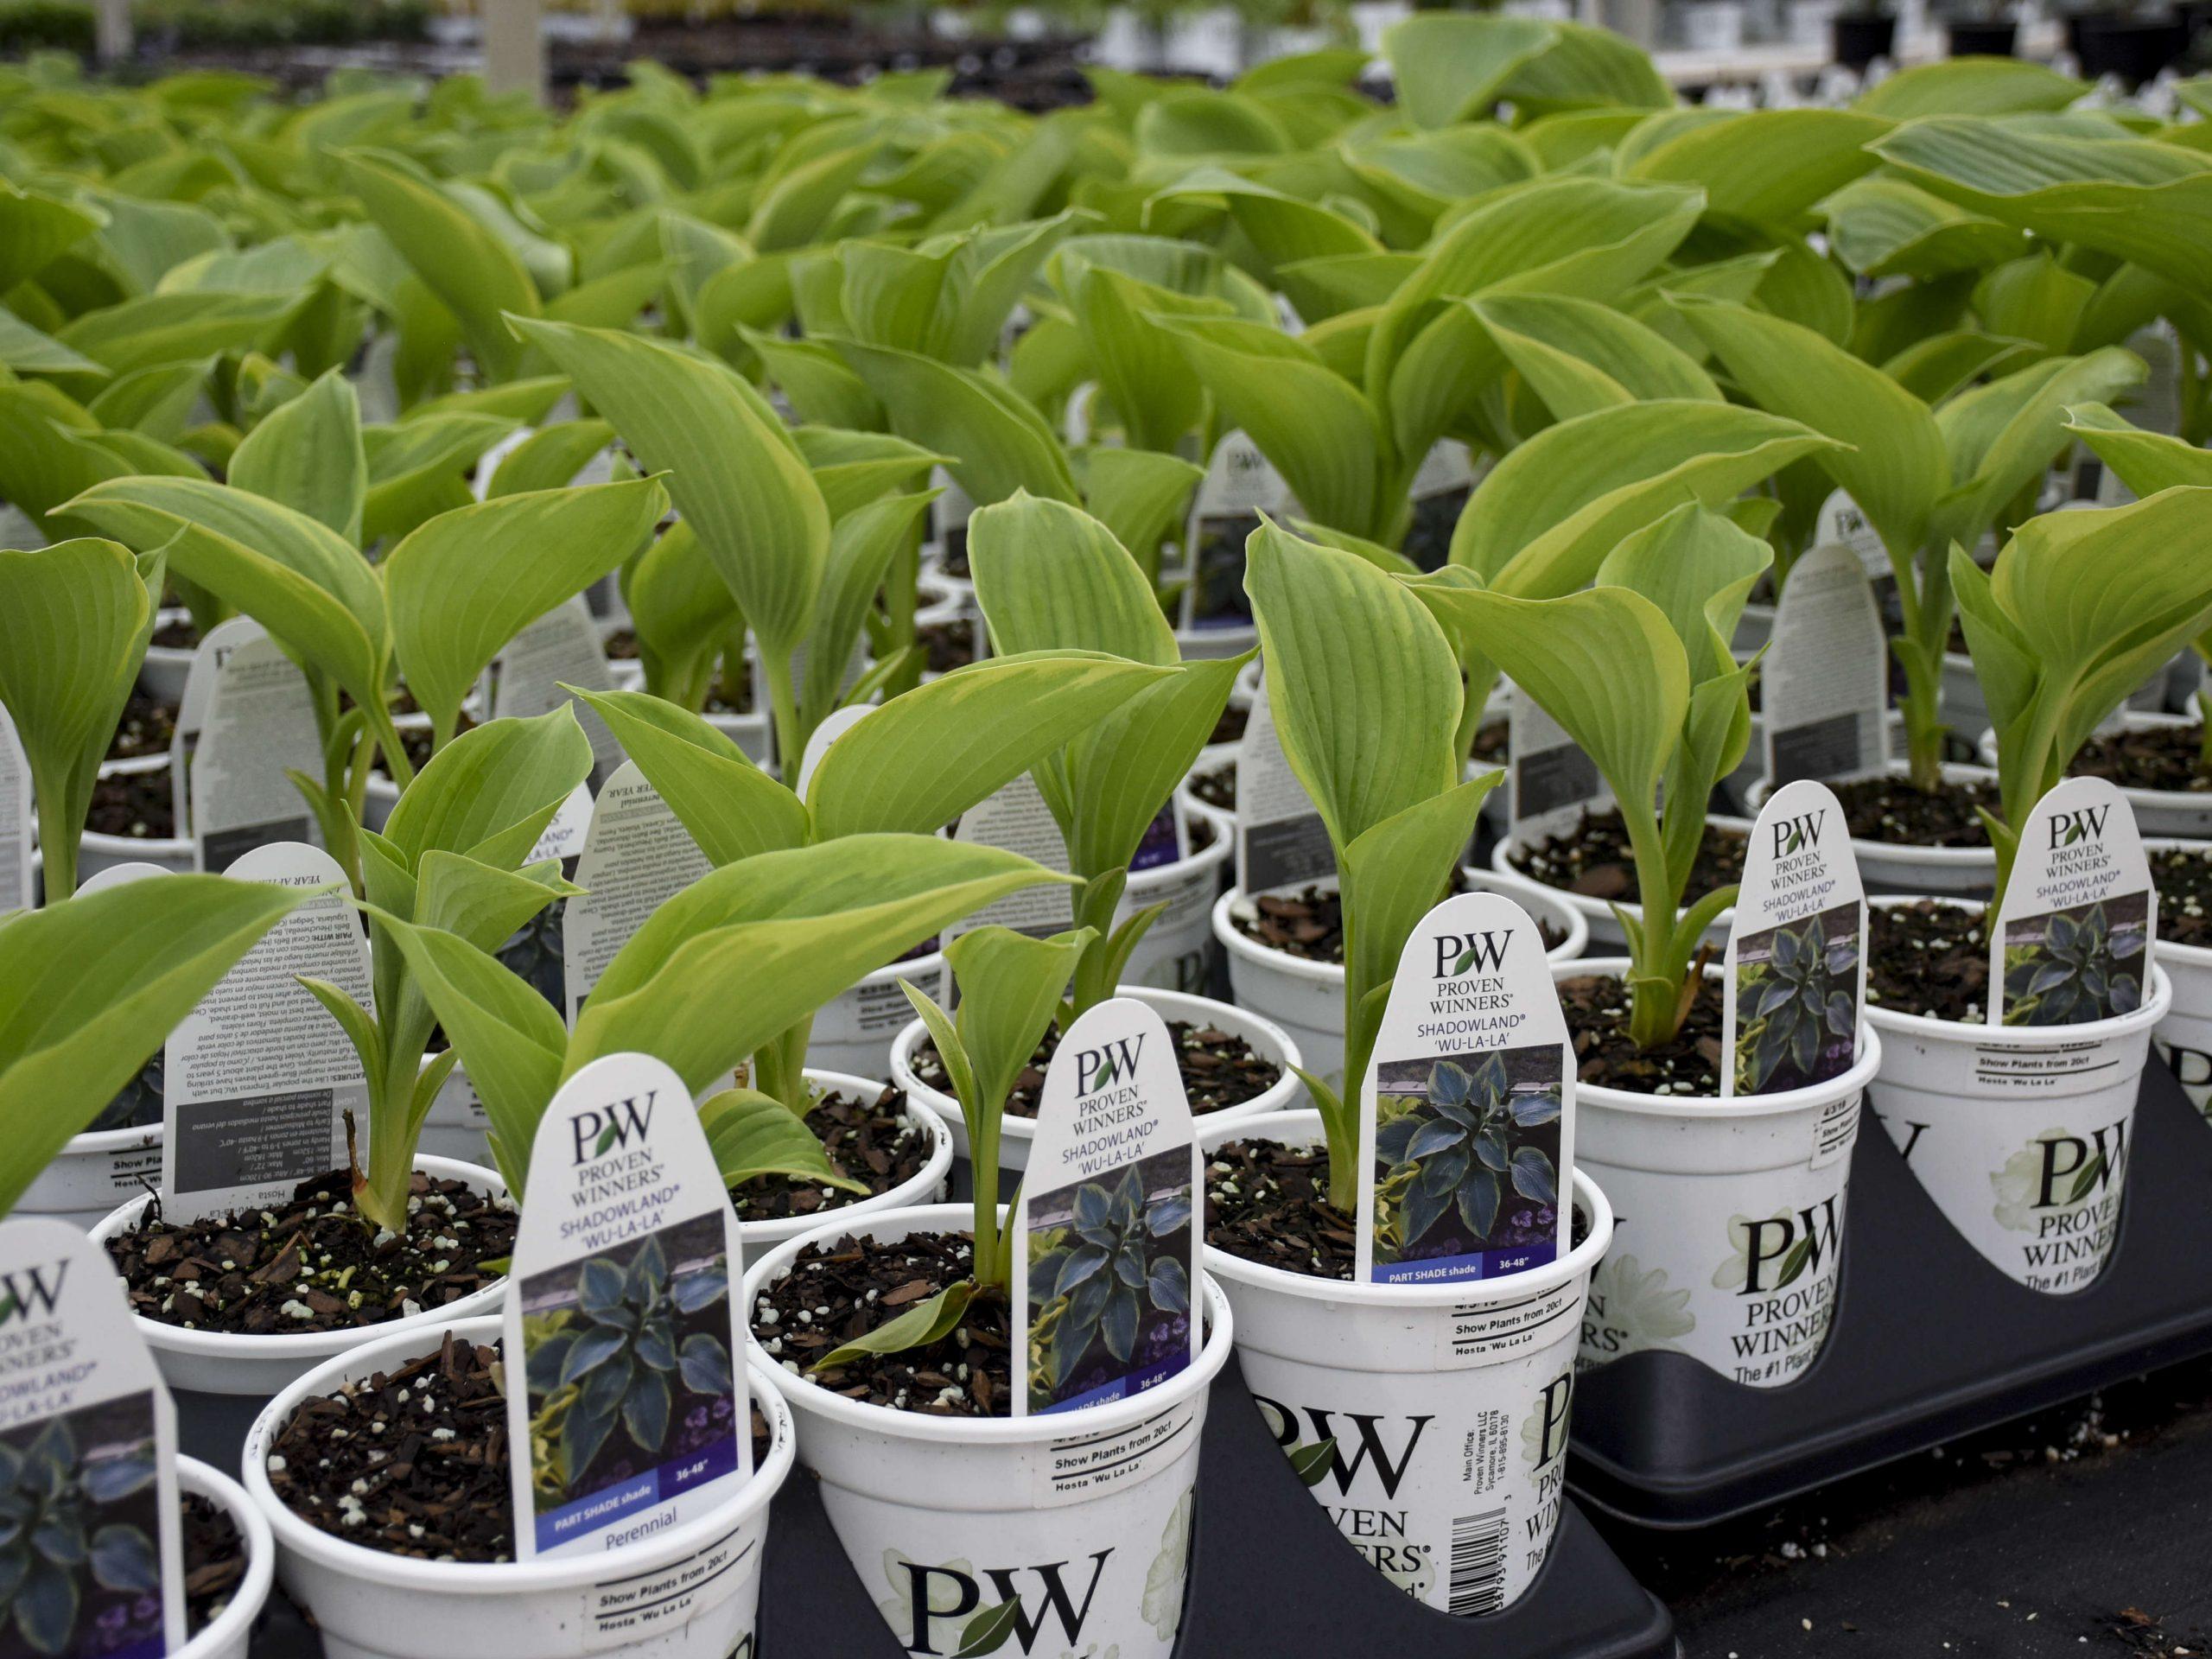 ters Gardens' Proven Winners plants